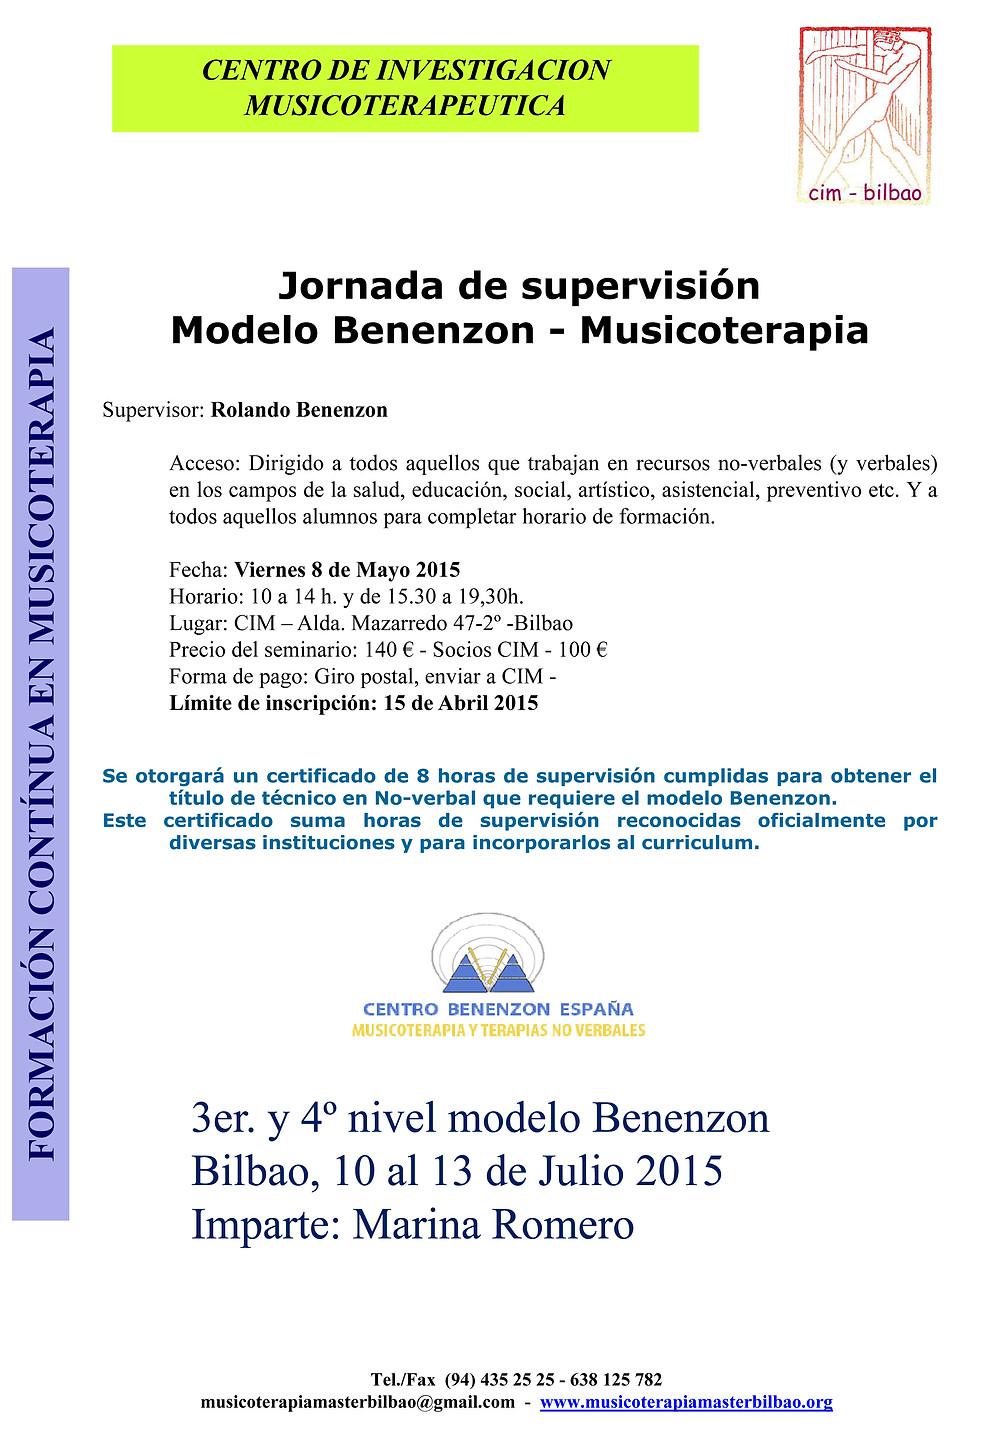 Supervision Benenzon -cim 2015.jpg